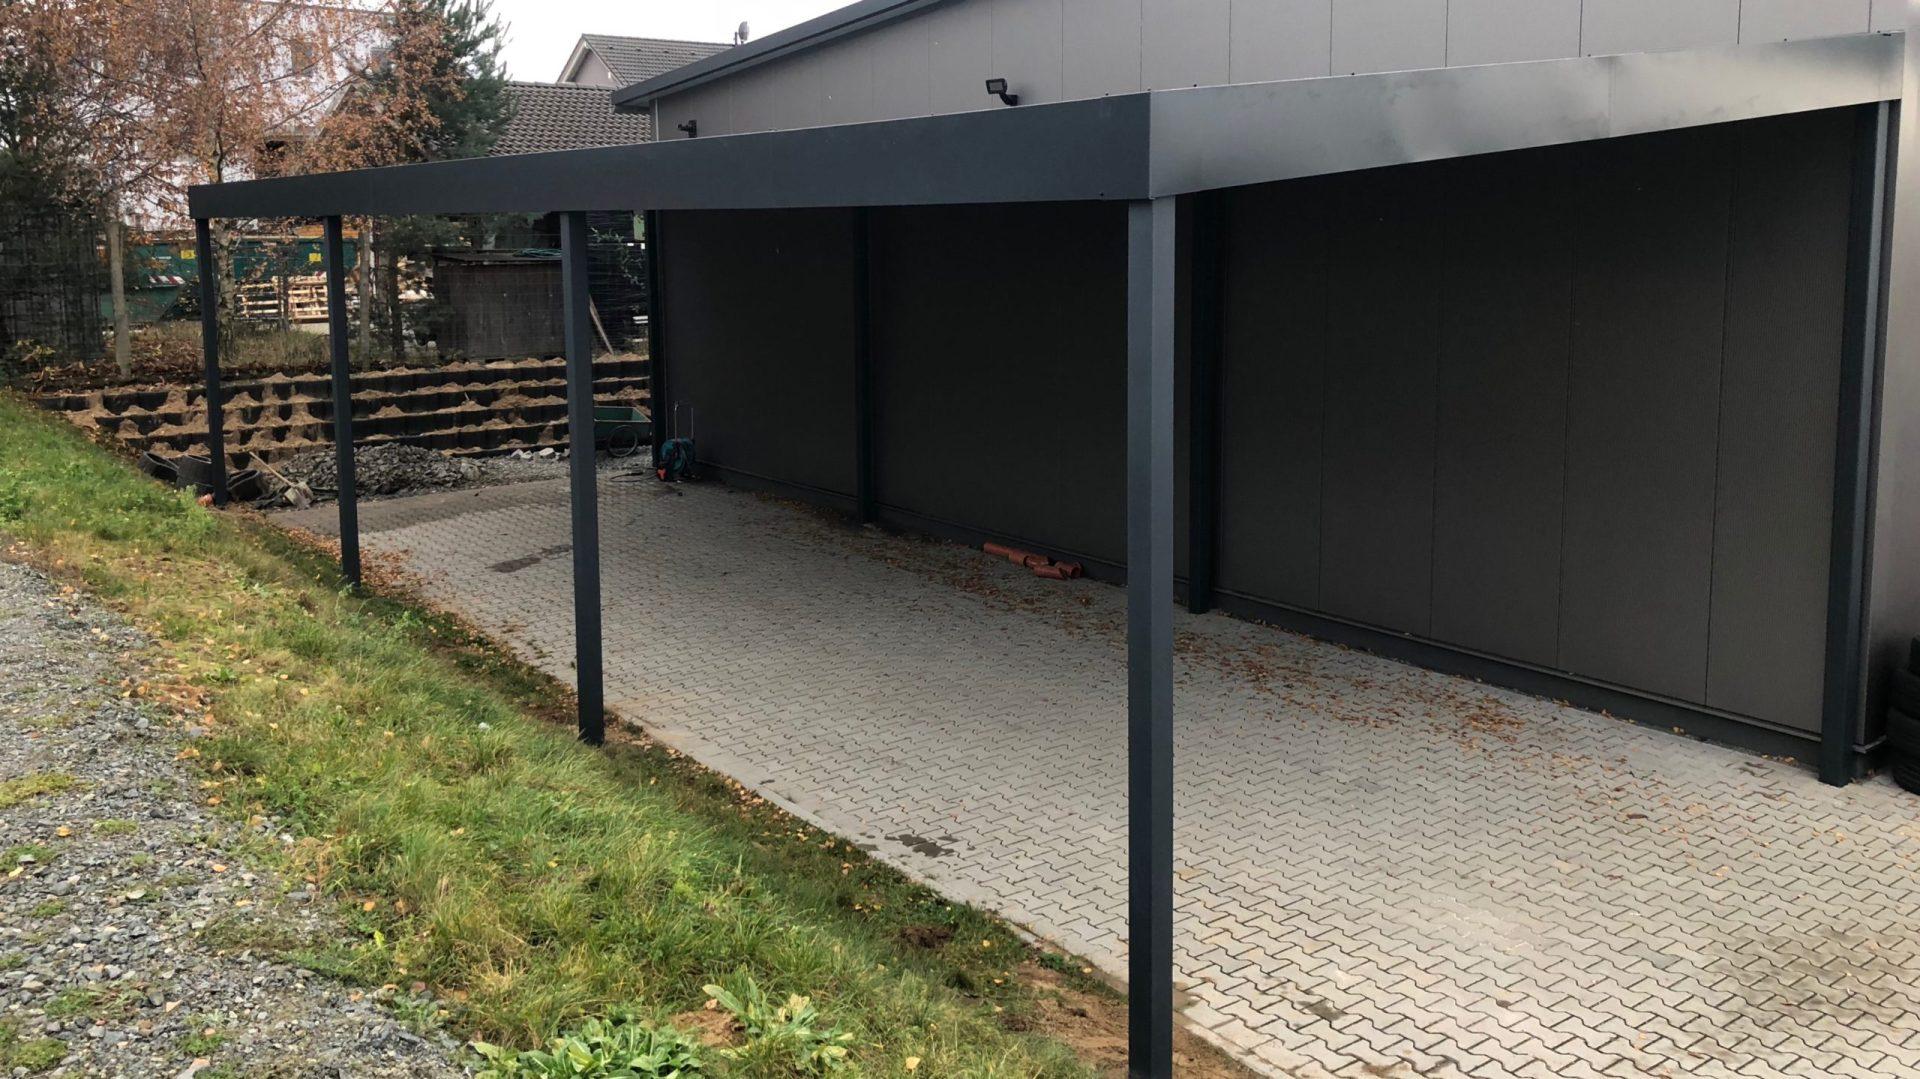 Reihencarport - Carportmaster Projekt 17-P-2019 - 64404 Bickenbach - Carportbild 01